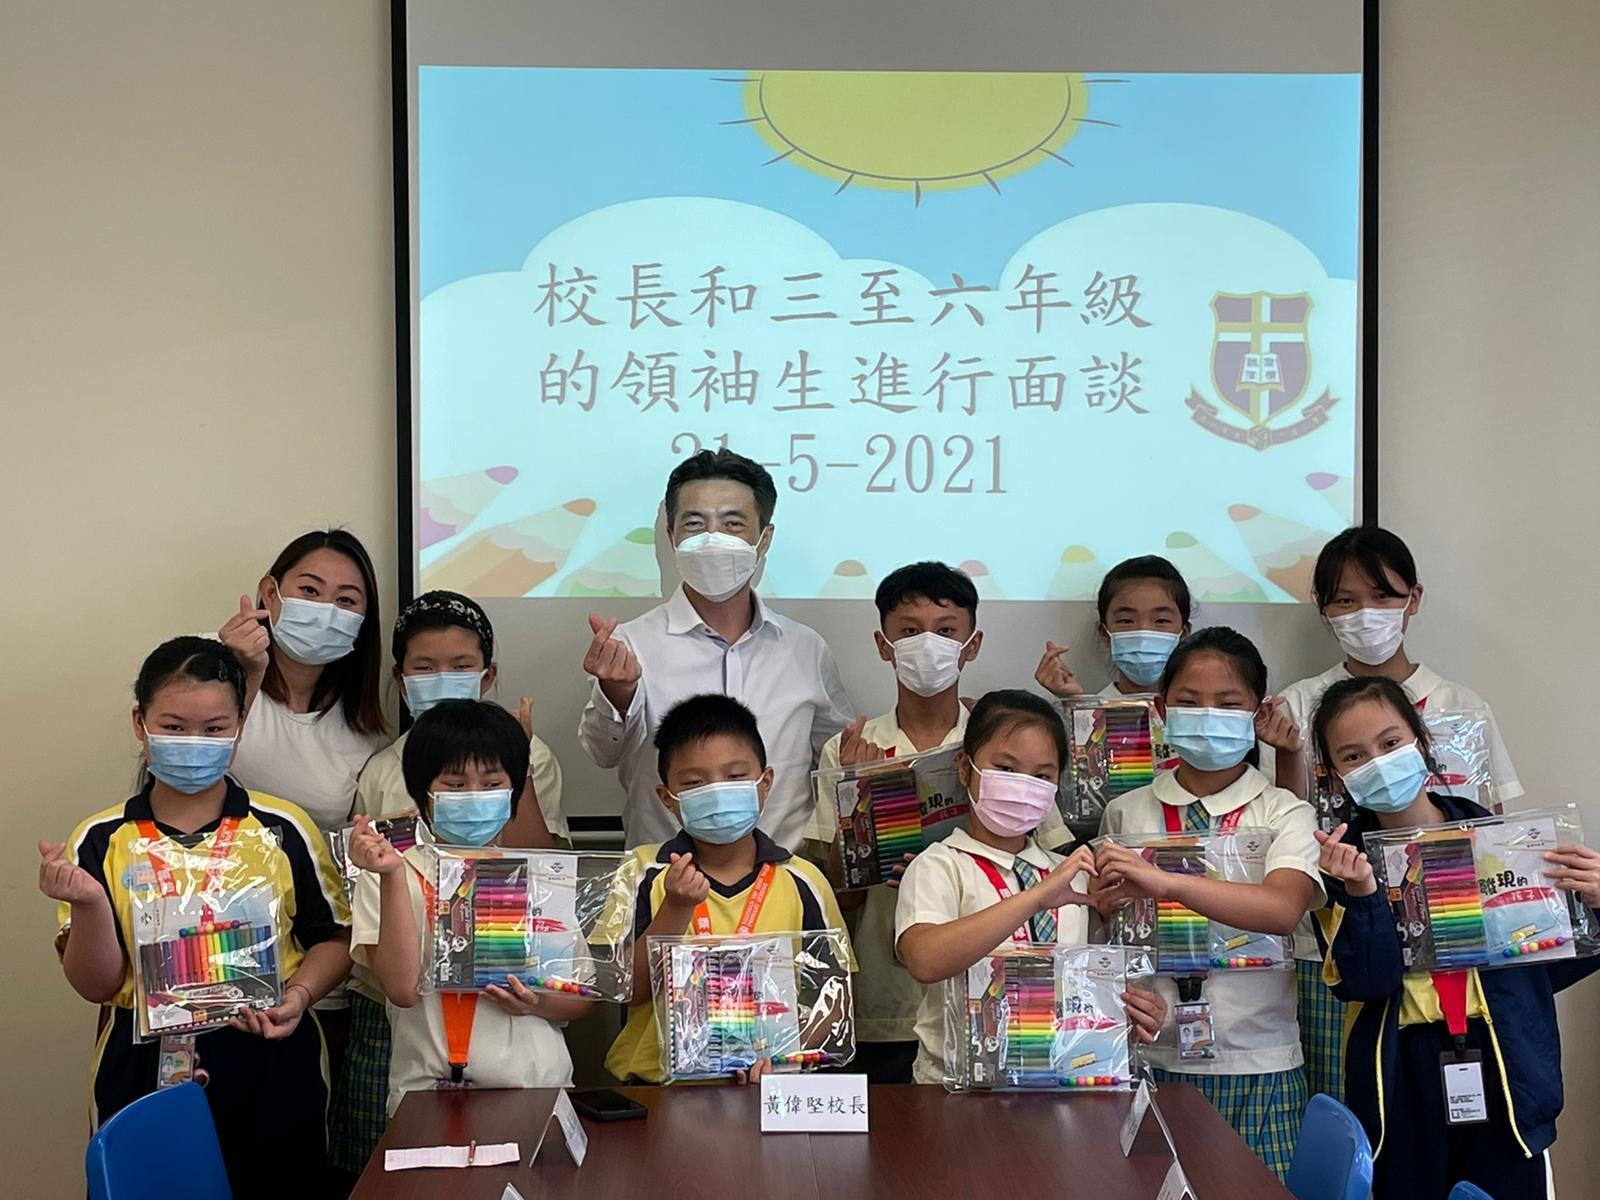 https://syh.edu.hk/sites/default/files/whatsapp_image_2021-05-24_at_12.37.44_pm.jpeg